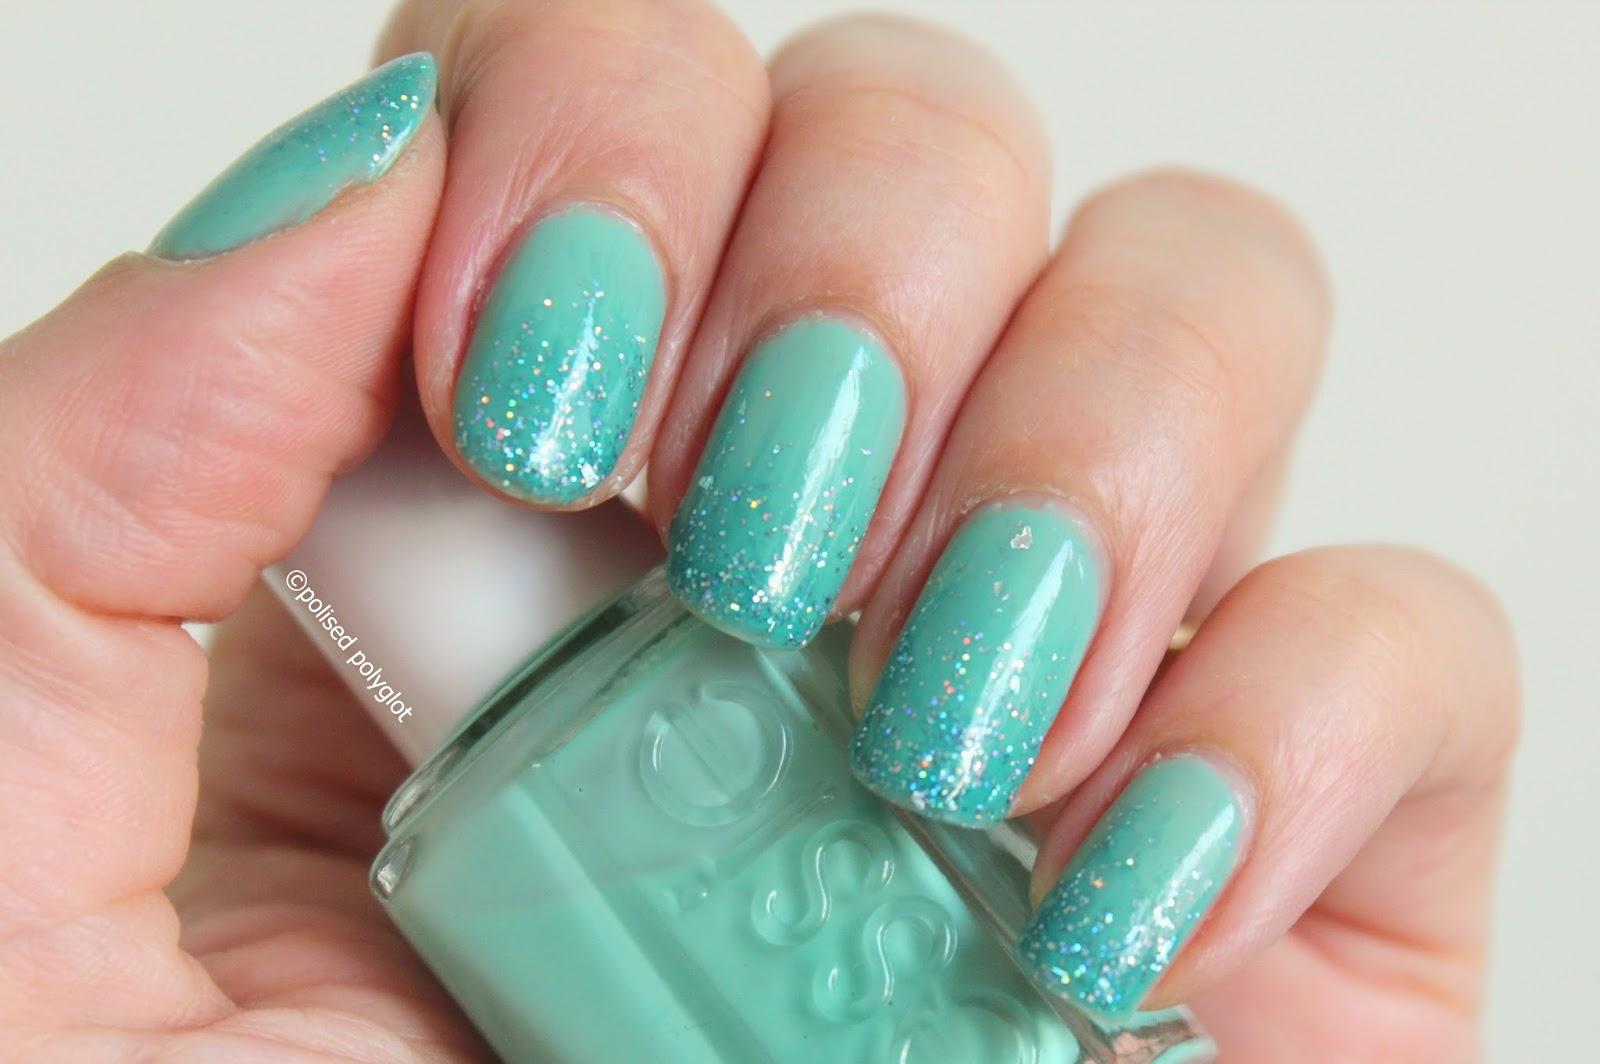 40 Great Nail Art Ideas: Aqua or turquoise / Polished Polyglot